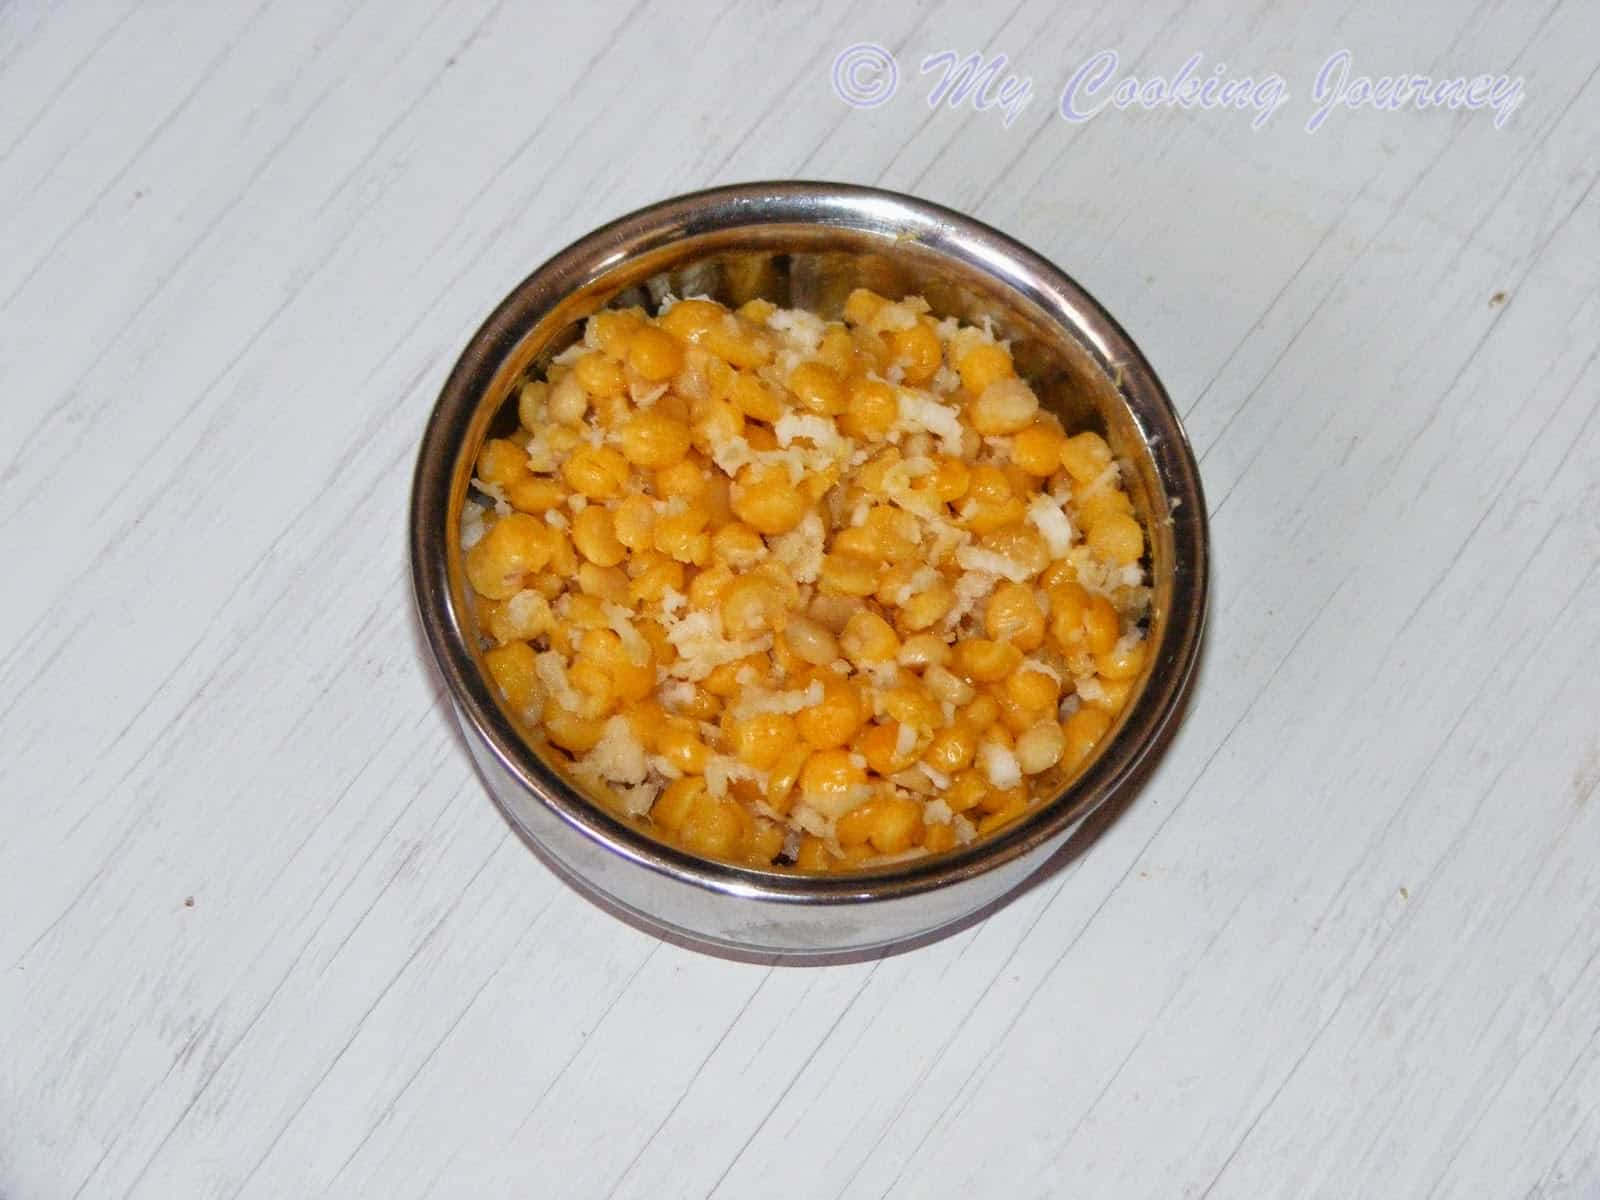 Kadalai Paruppu Sweet Kosumalli – Channa dal Sweet Salad